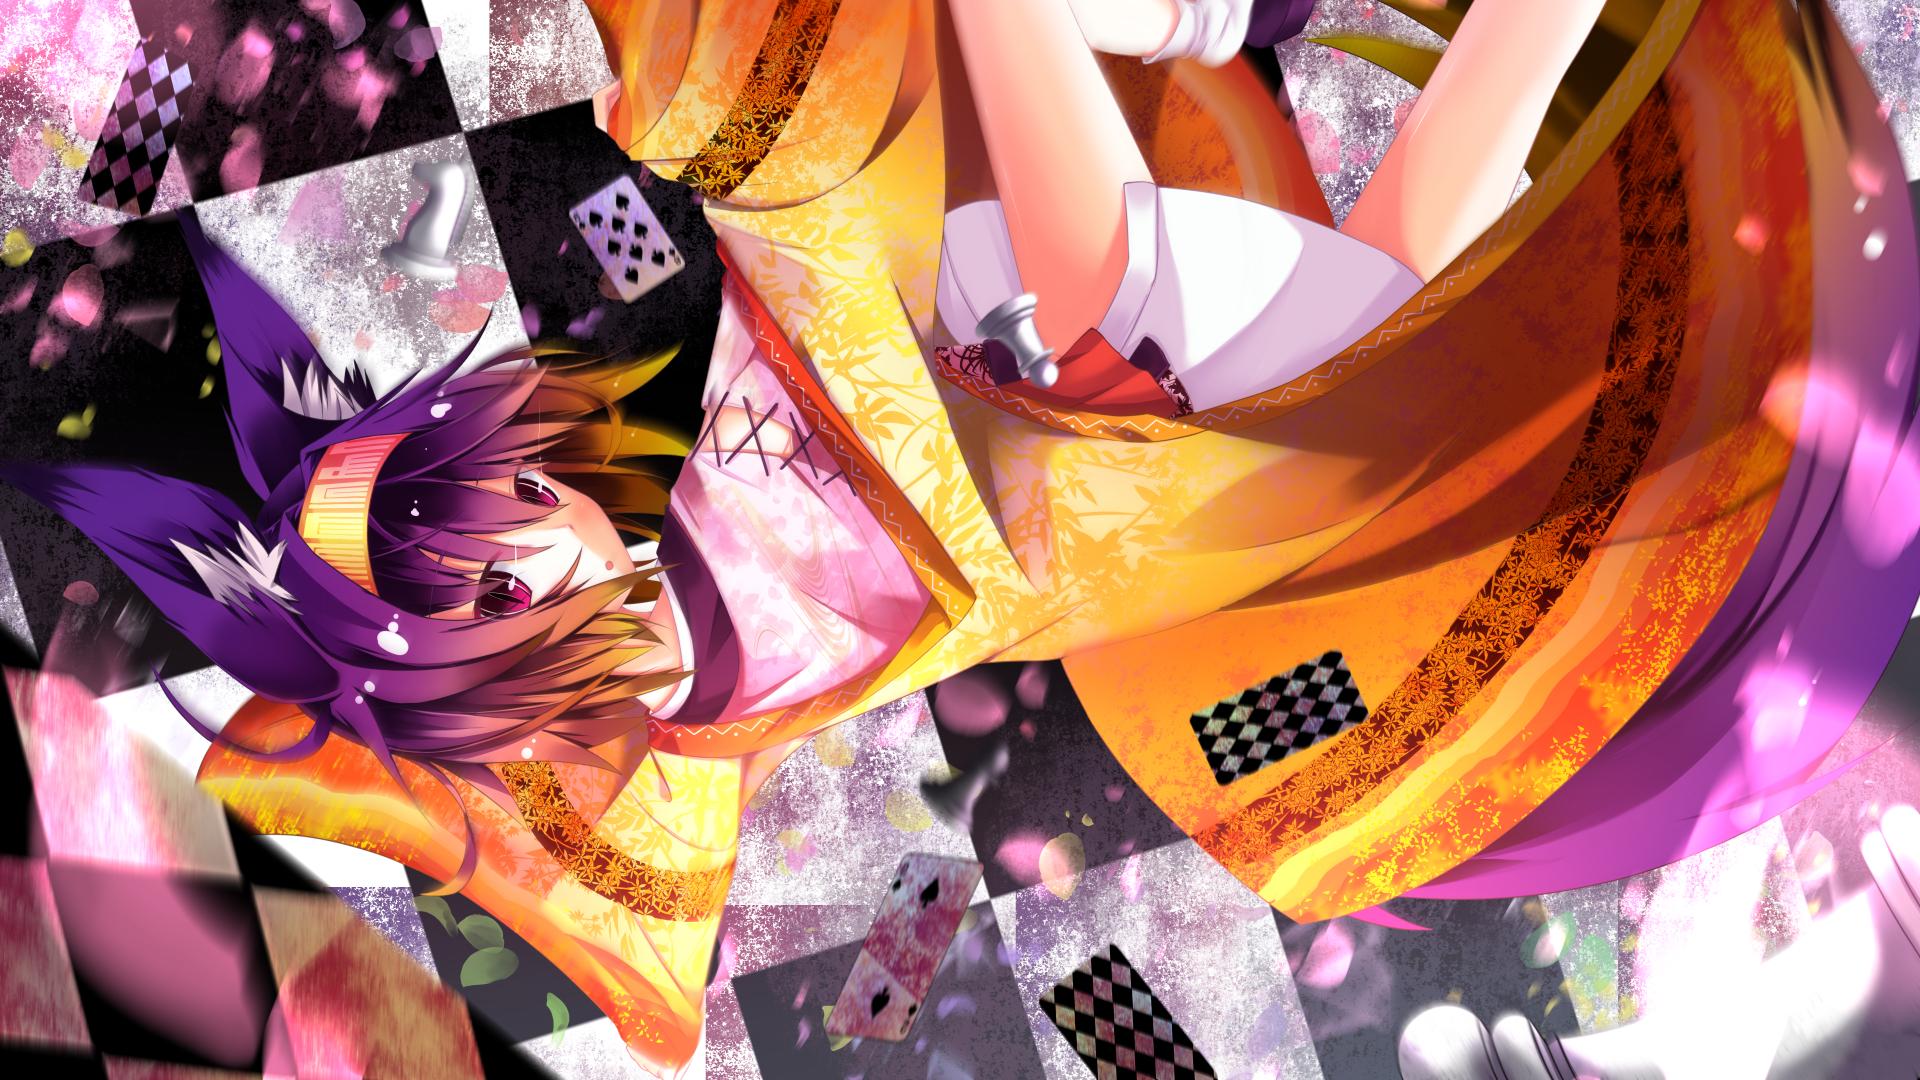 Anime 1920x1080 Hatsuse Izuna No Game No Life purple hair animal ears purple eyes anime girls inumimi anime manga